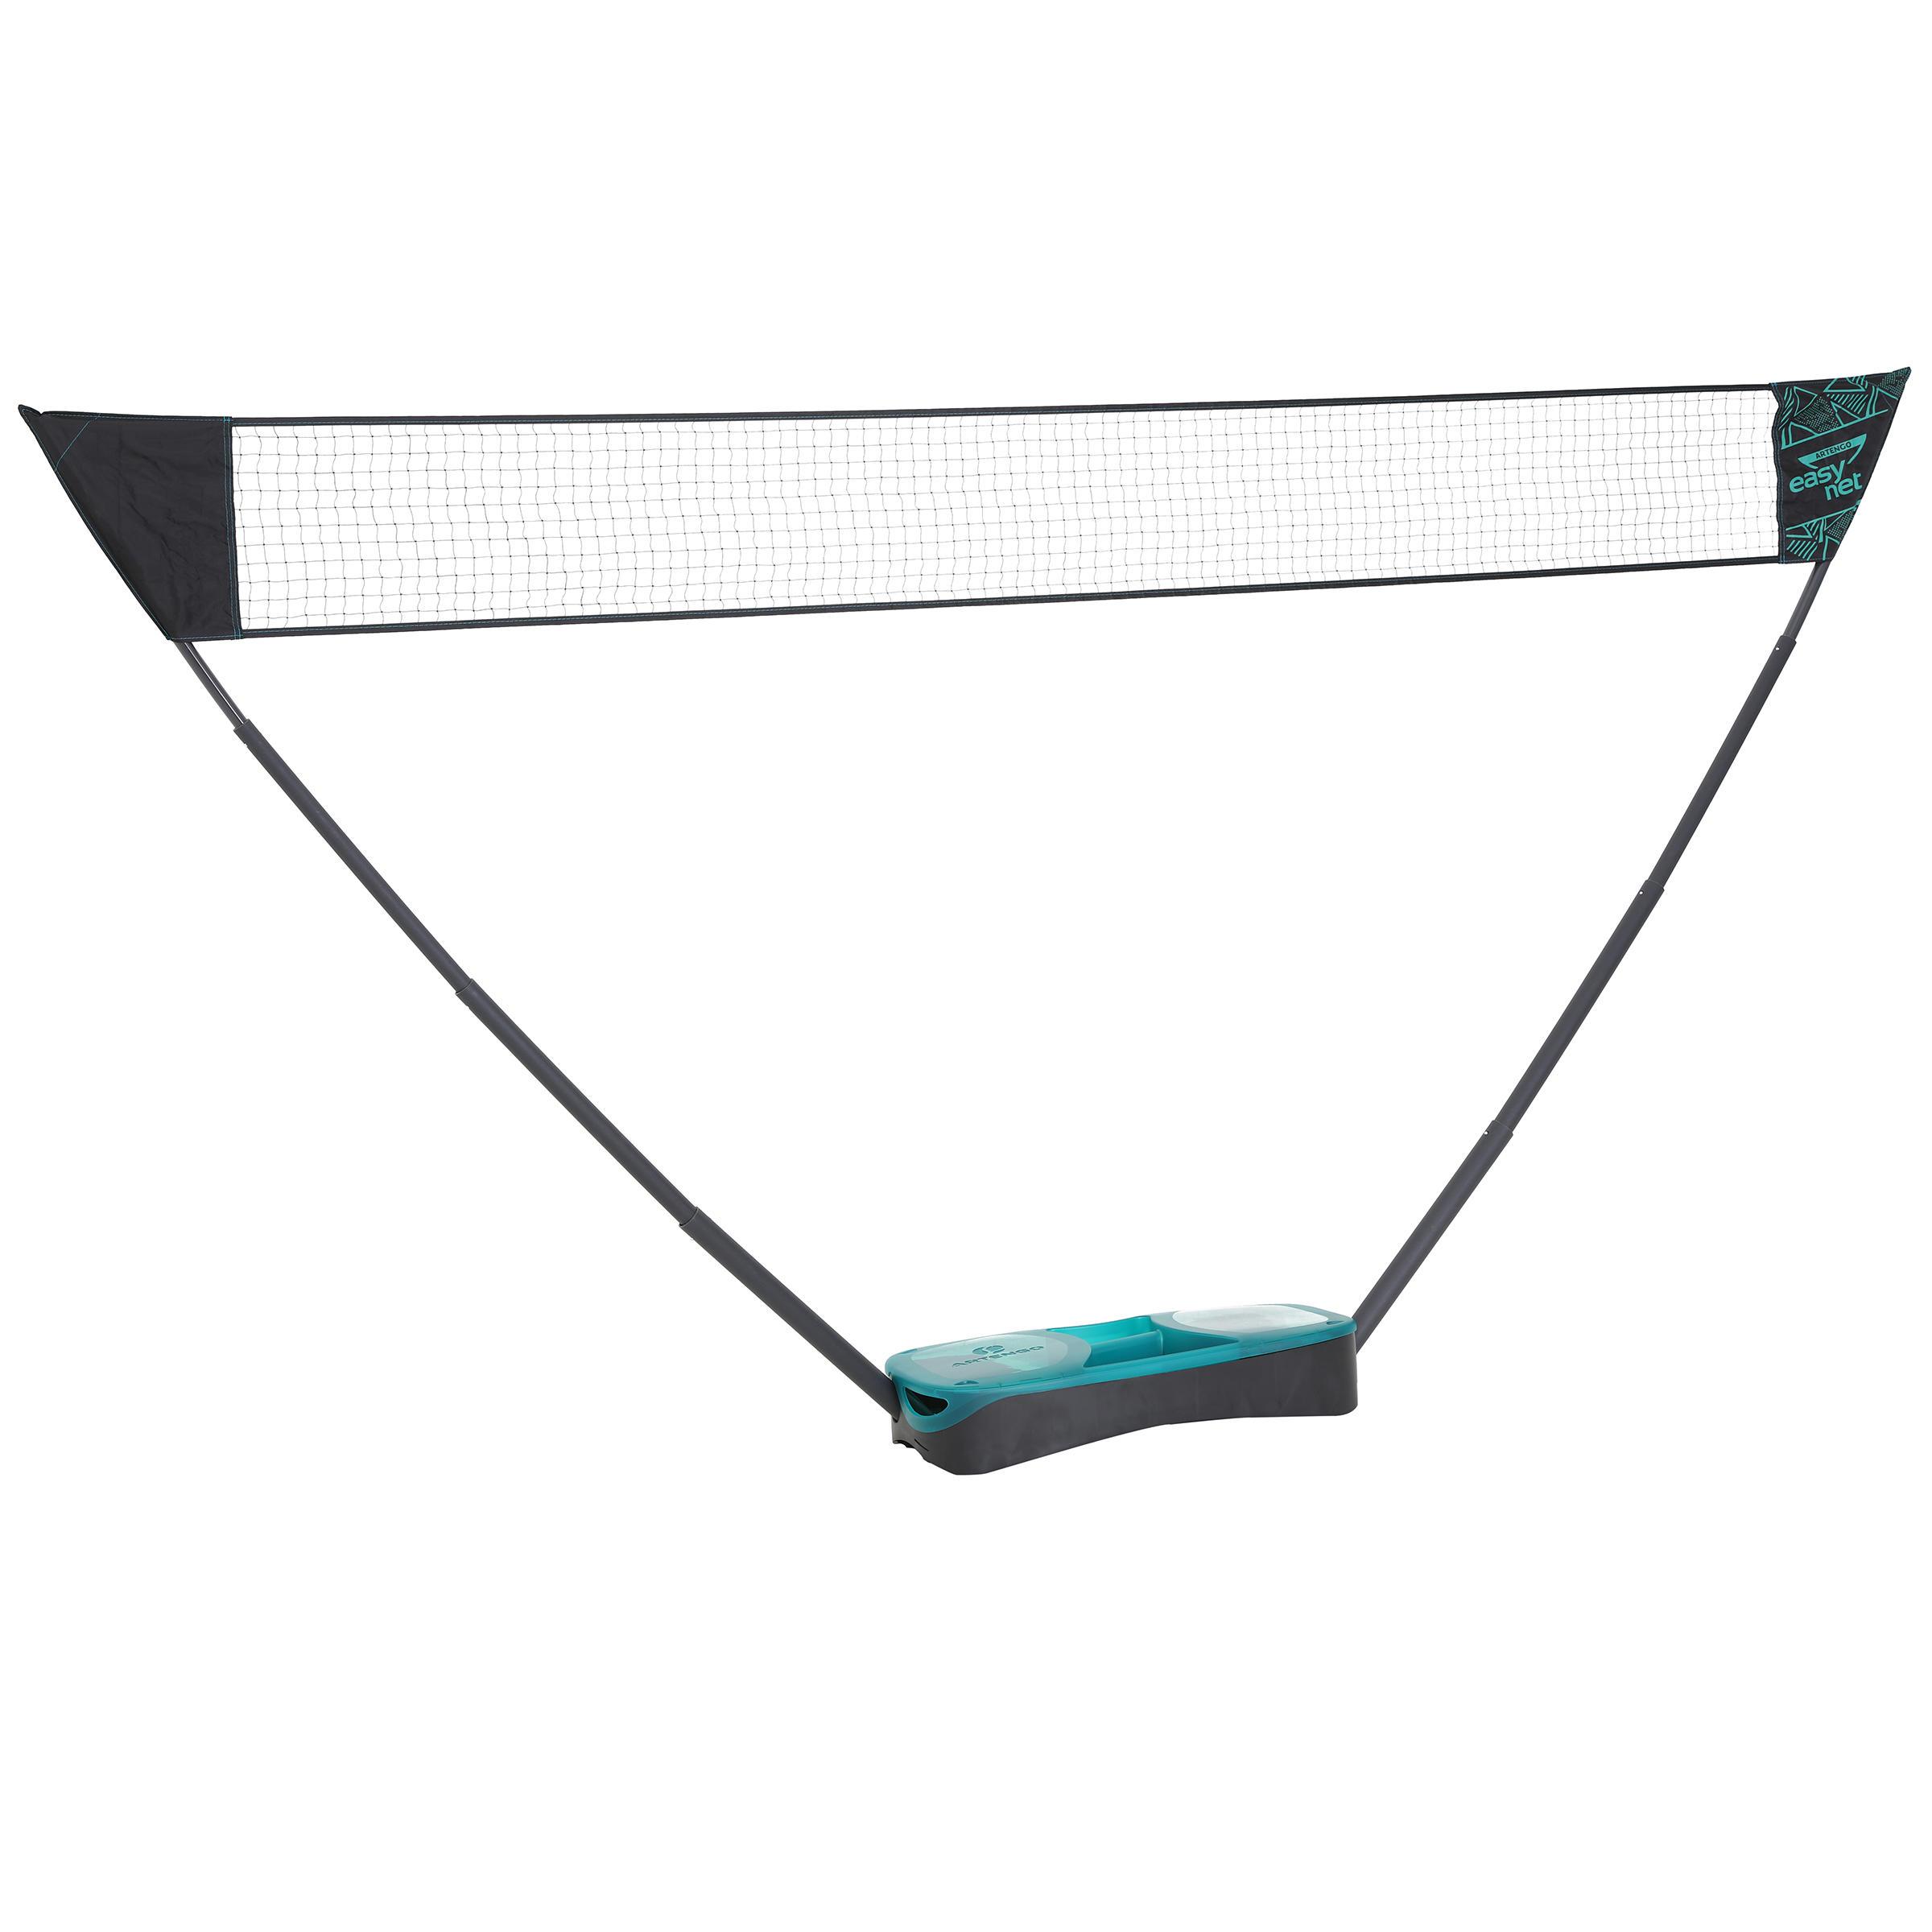 Artengo Badmintonset Easy Set 3M